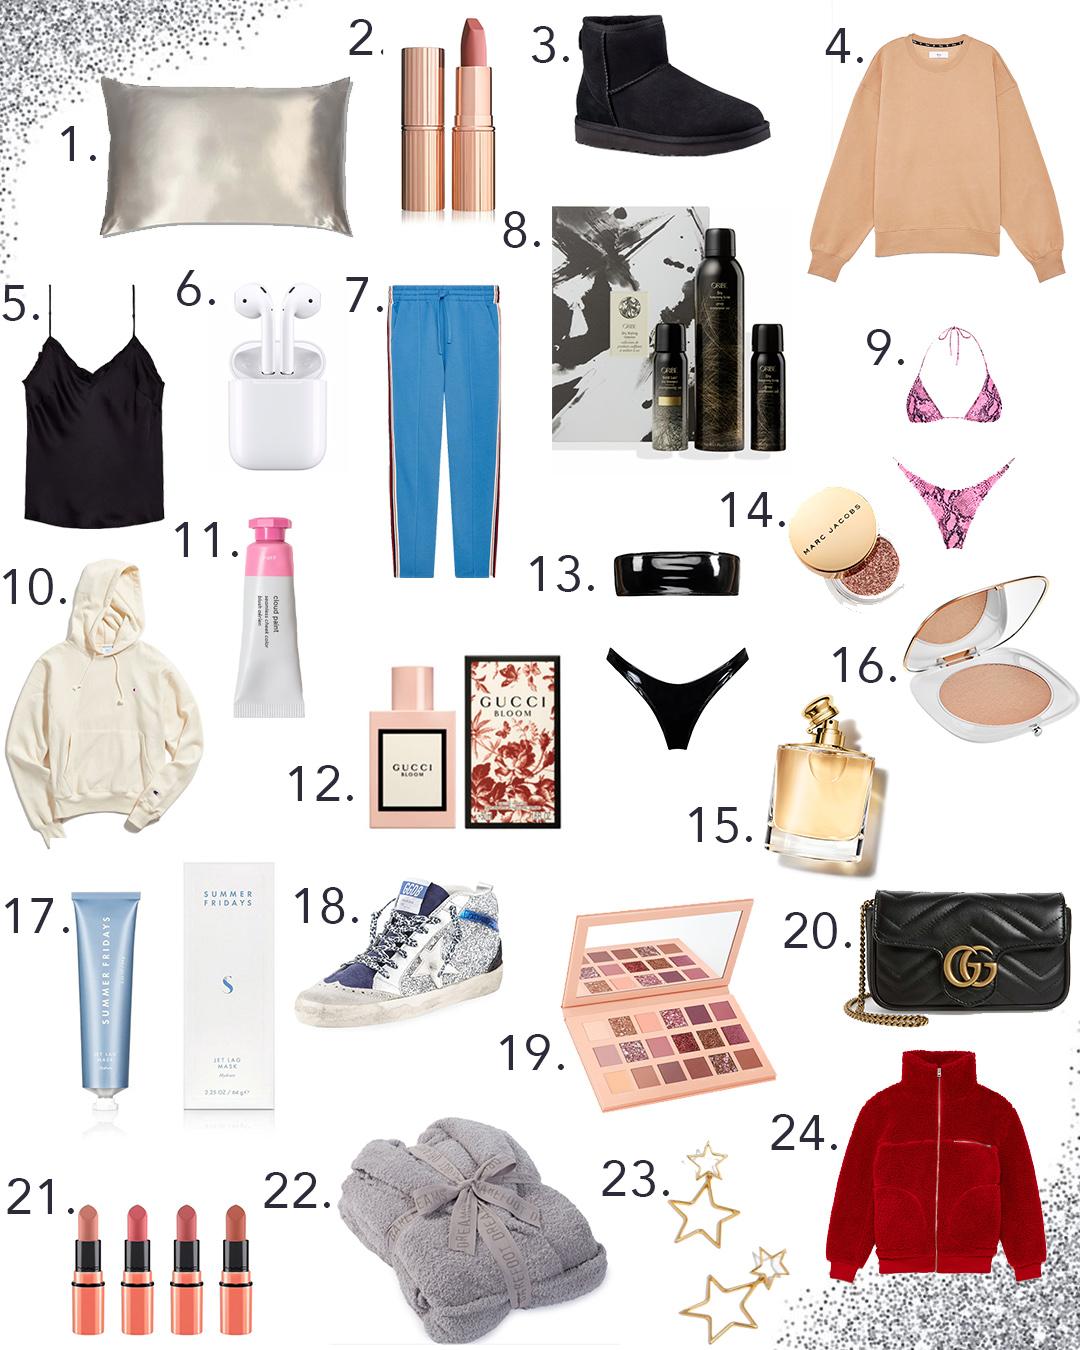 Stuff To Ask For For Christmas.Our Christmas Holiday Wishlist Matched Maven